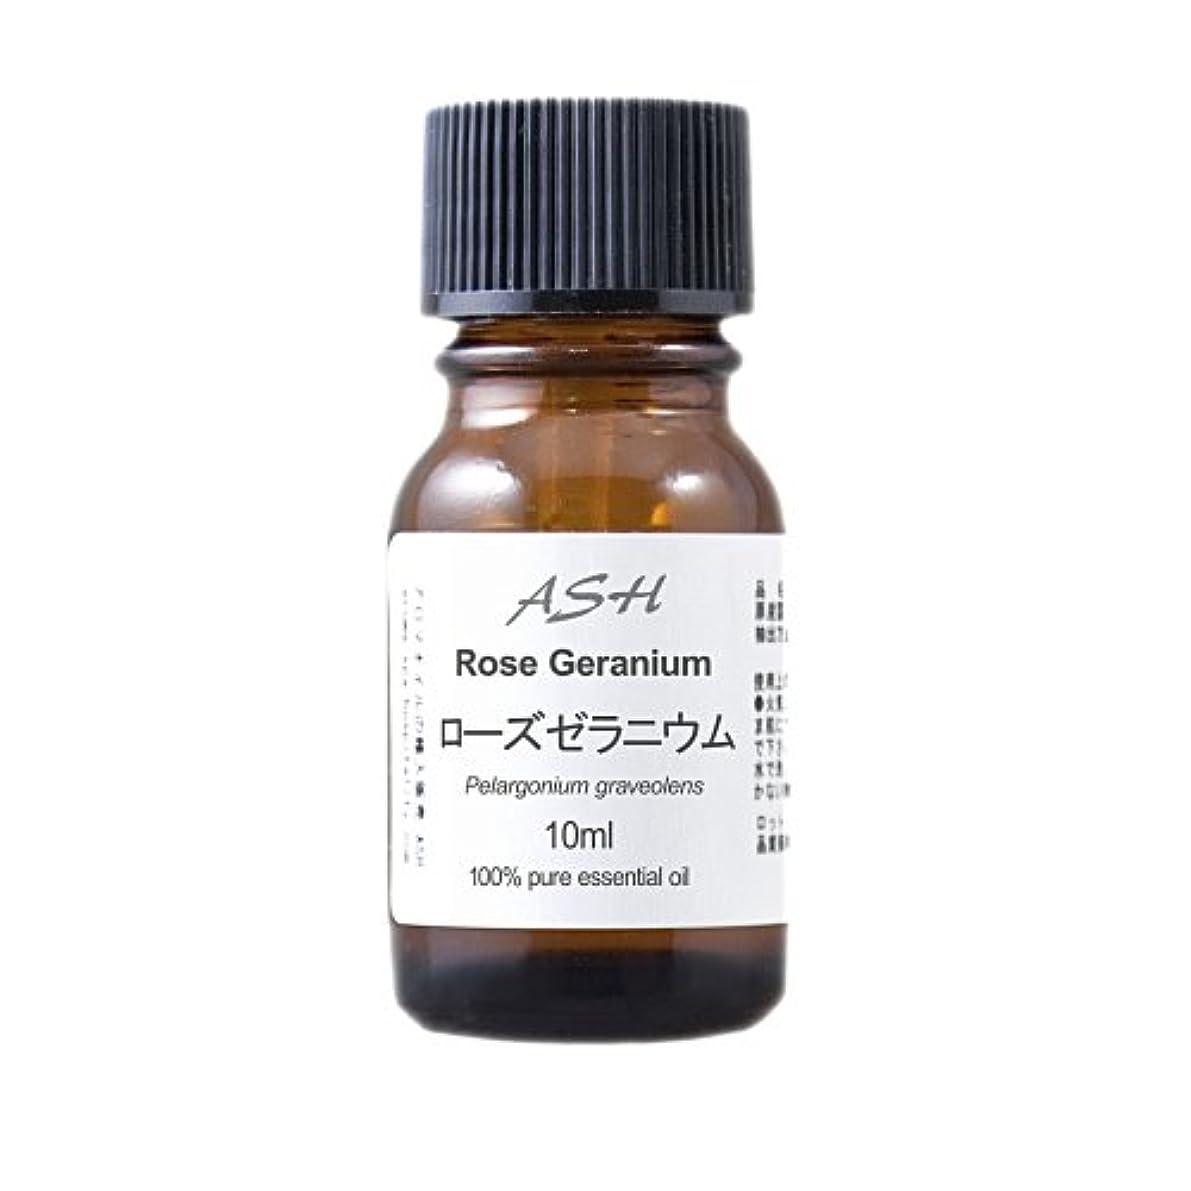 ASH ローズゼラニウム エッセンシャルオイル 10ml AEAJ表示基準適合認定精油